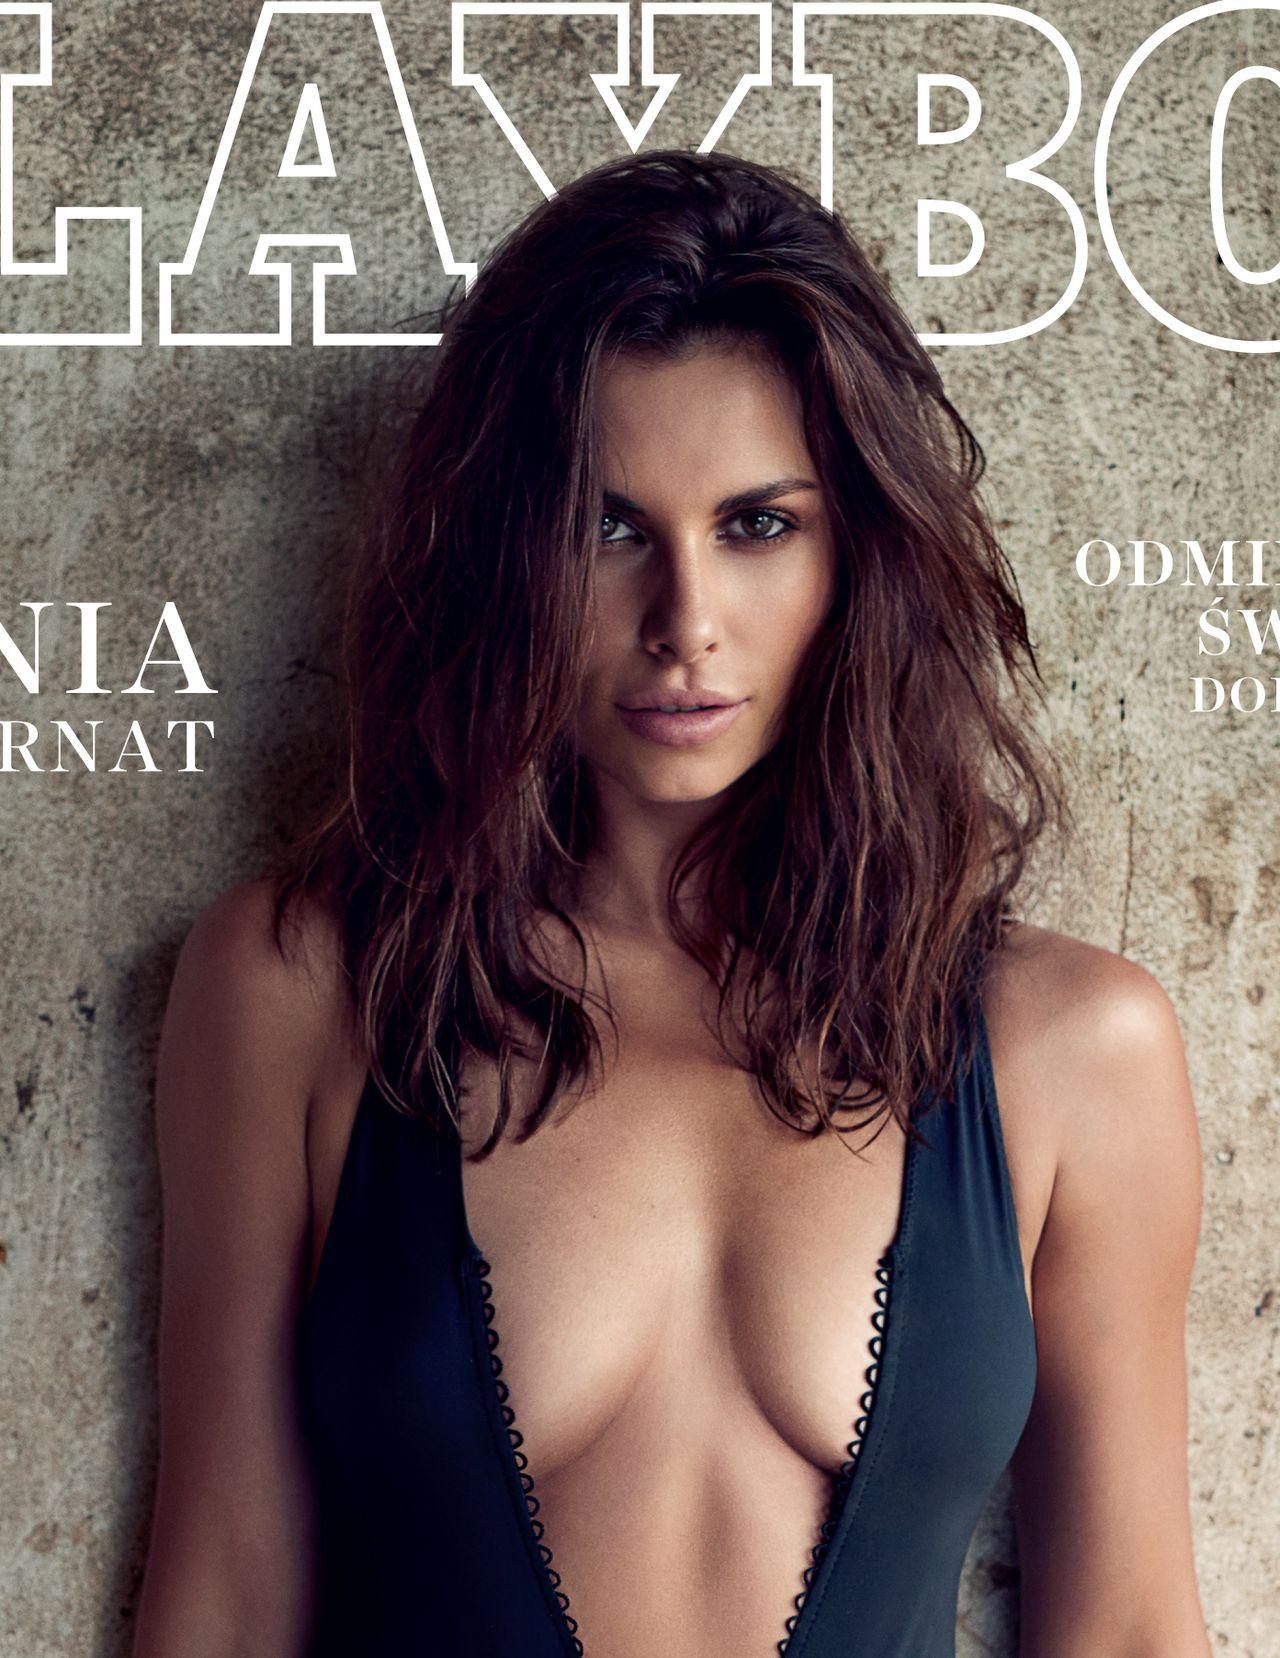 Biernat  nackt Agata Agata Biernat: